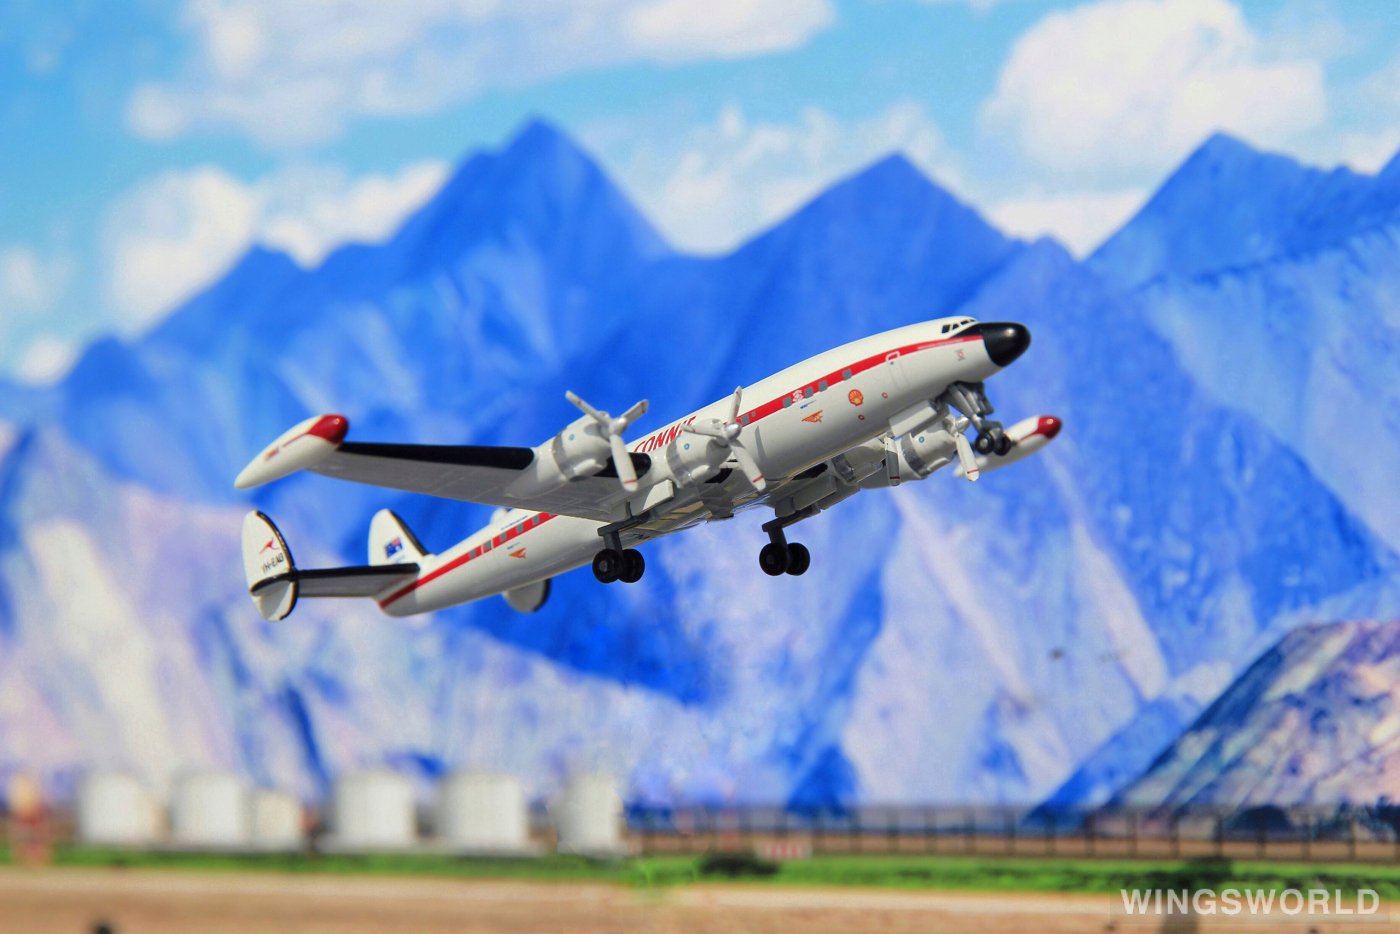 Dragon Models 1:400 55539 Historical Aircraft Restoration Society Lockheed L-1049 Super Constellation VH-EAG